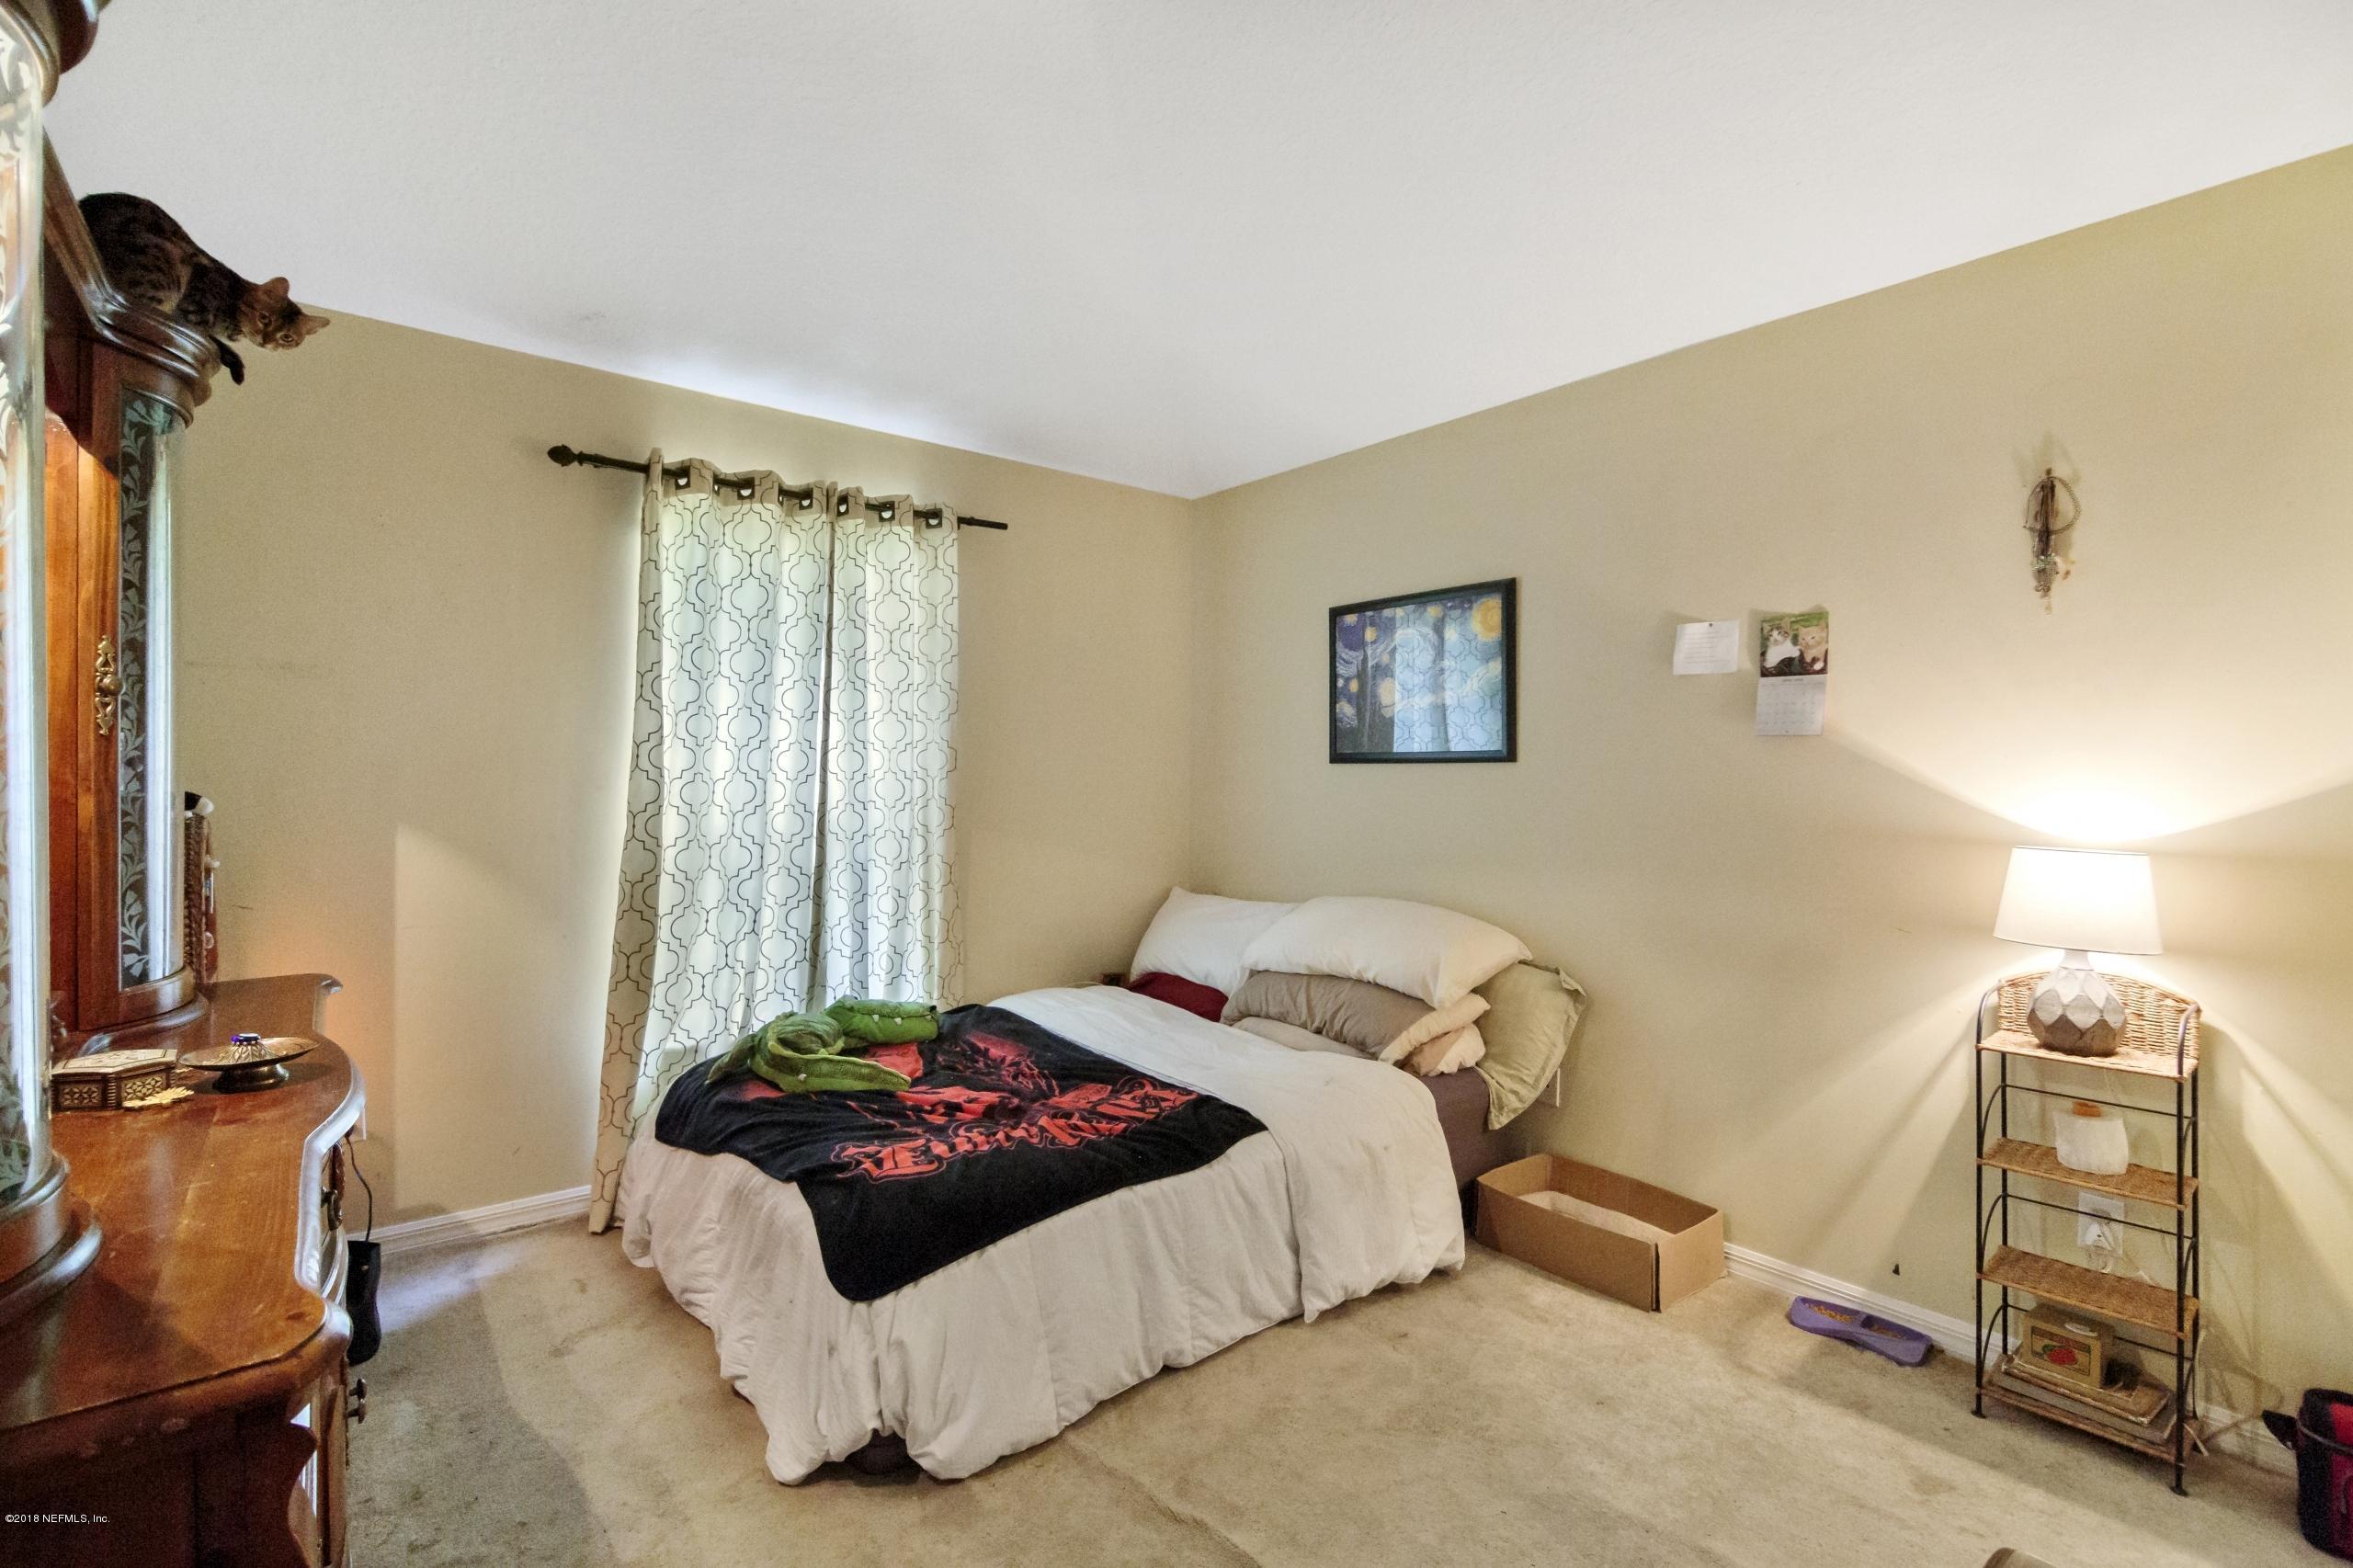 948 WINDWARD, ST AUGUSTINE, FLORIDA 32080, 3 Bedrooms Bedrooms, ,2 BathroomsBathrooms,Residential - single family,For sale,WINDWARD,943937